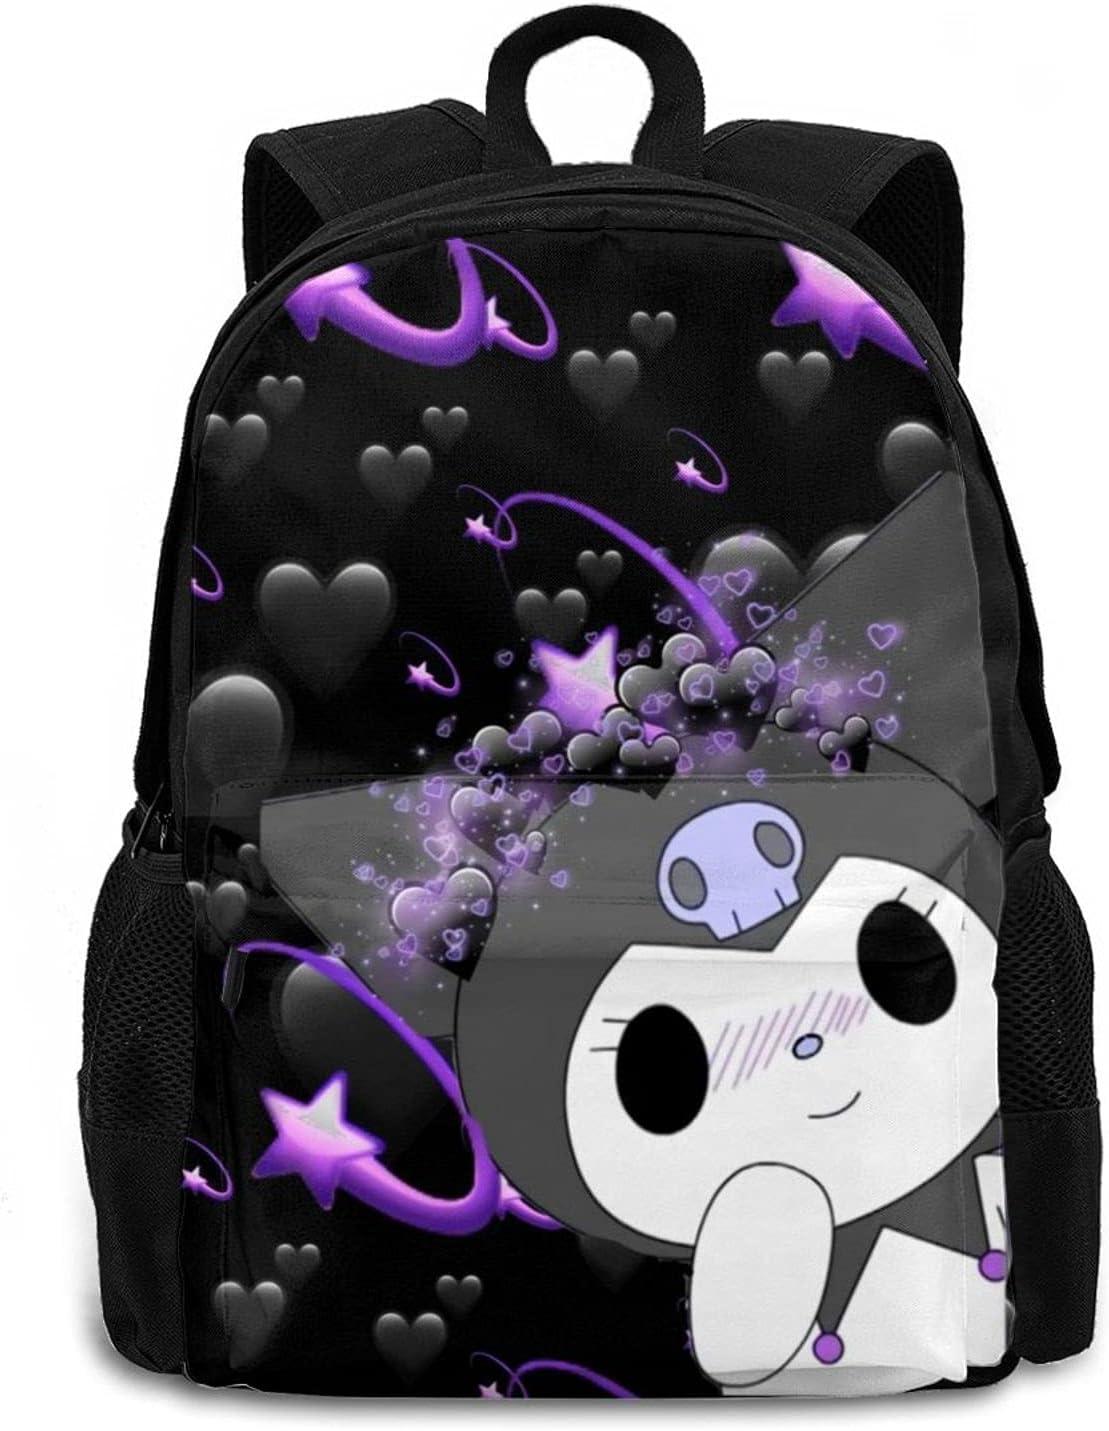 Kuromi My Large discharge sale Melody Kids Backpack Boys Pr bookbag Ultra-Cheap Deals 3D and Girls Game